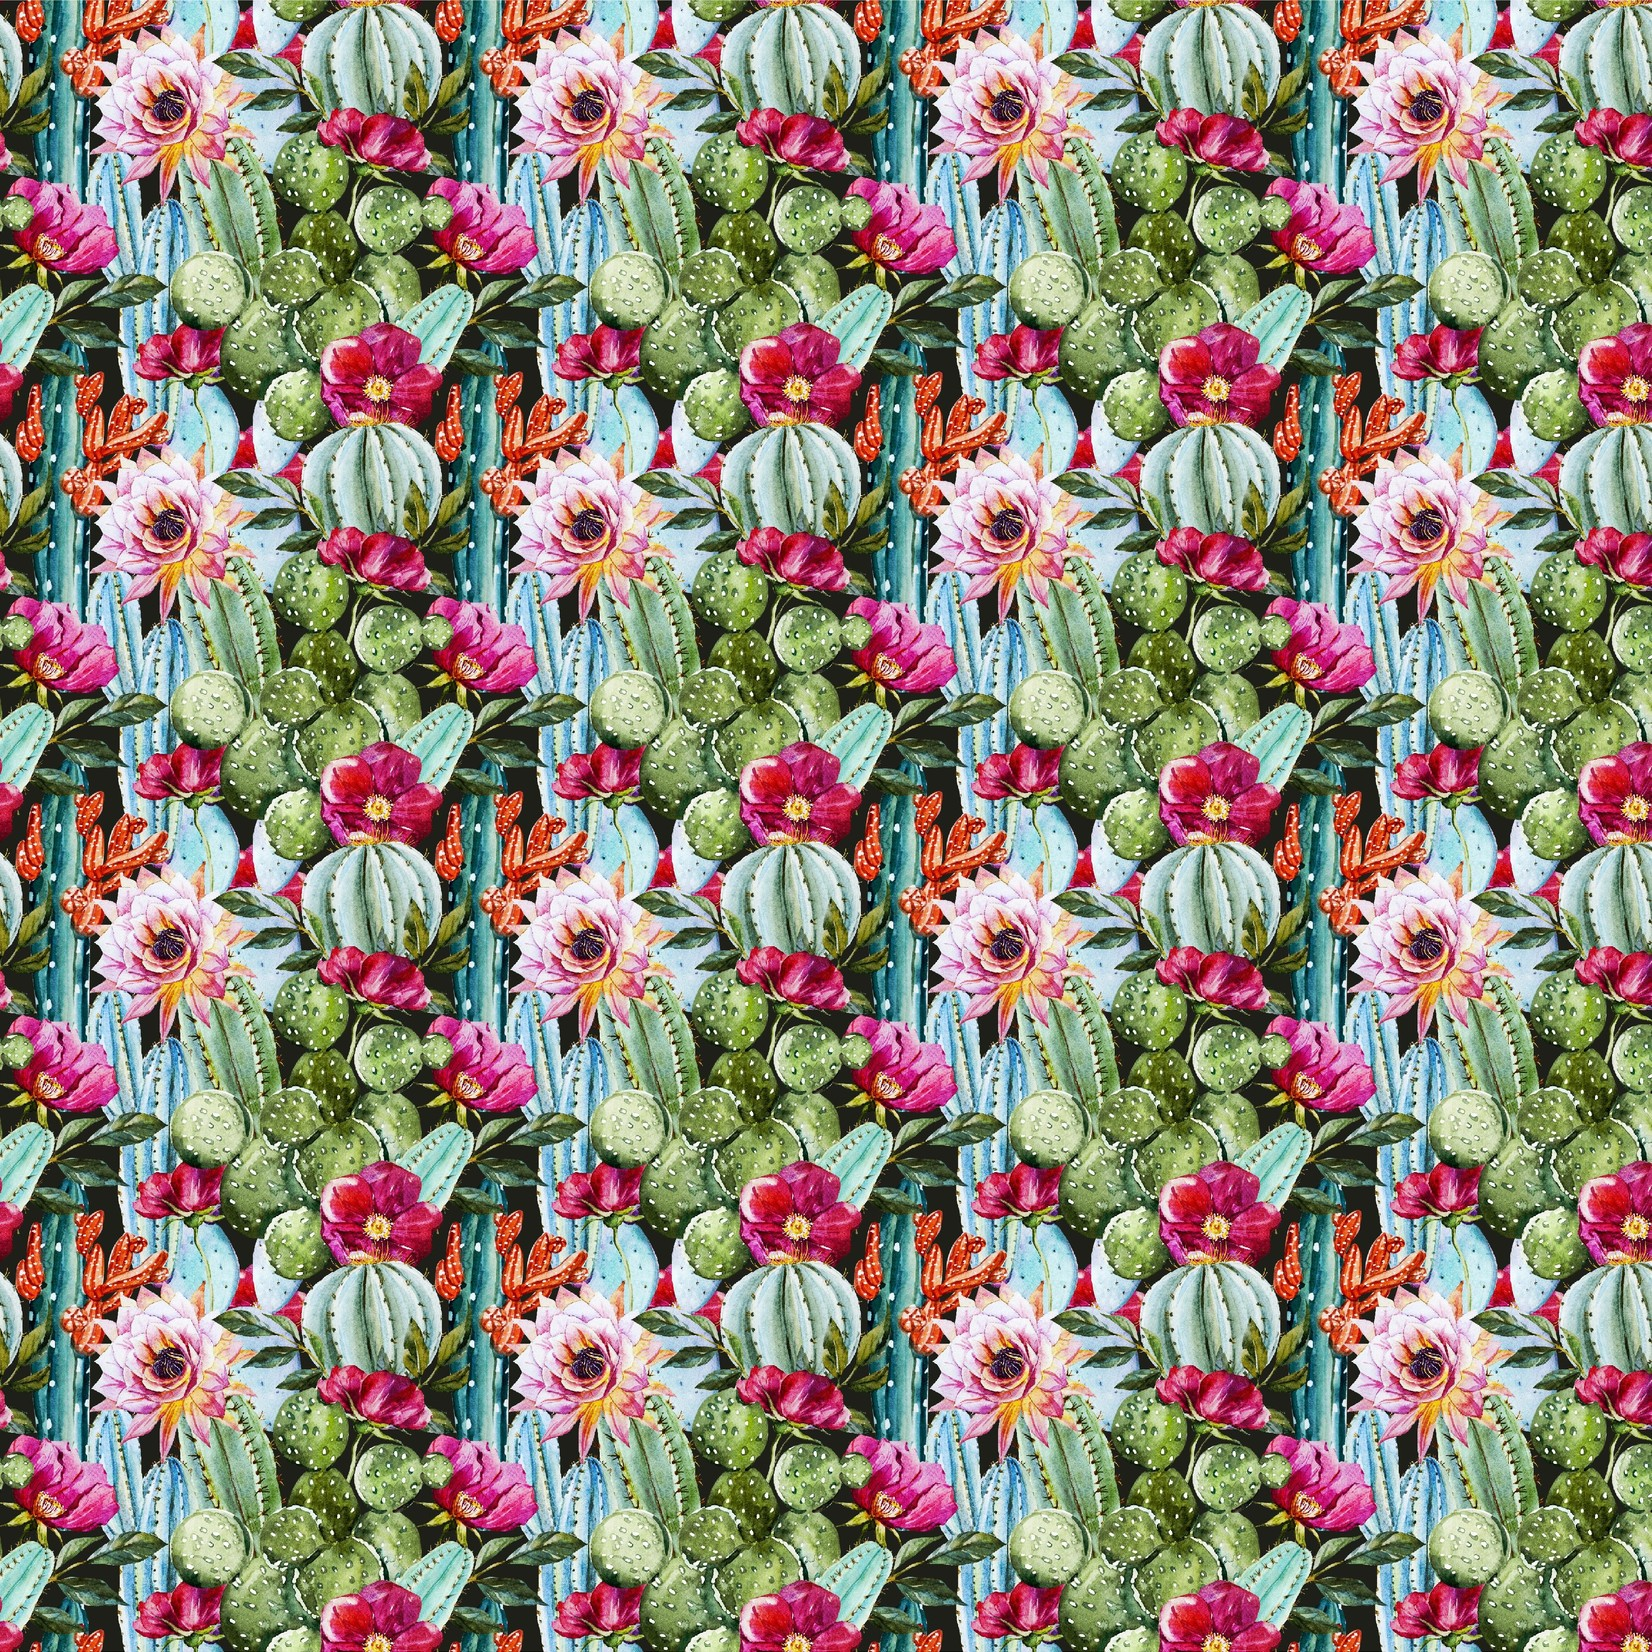 TVD Cactus Flowers